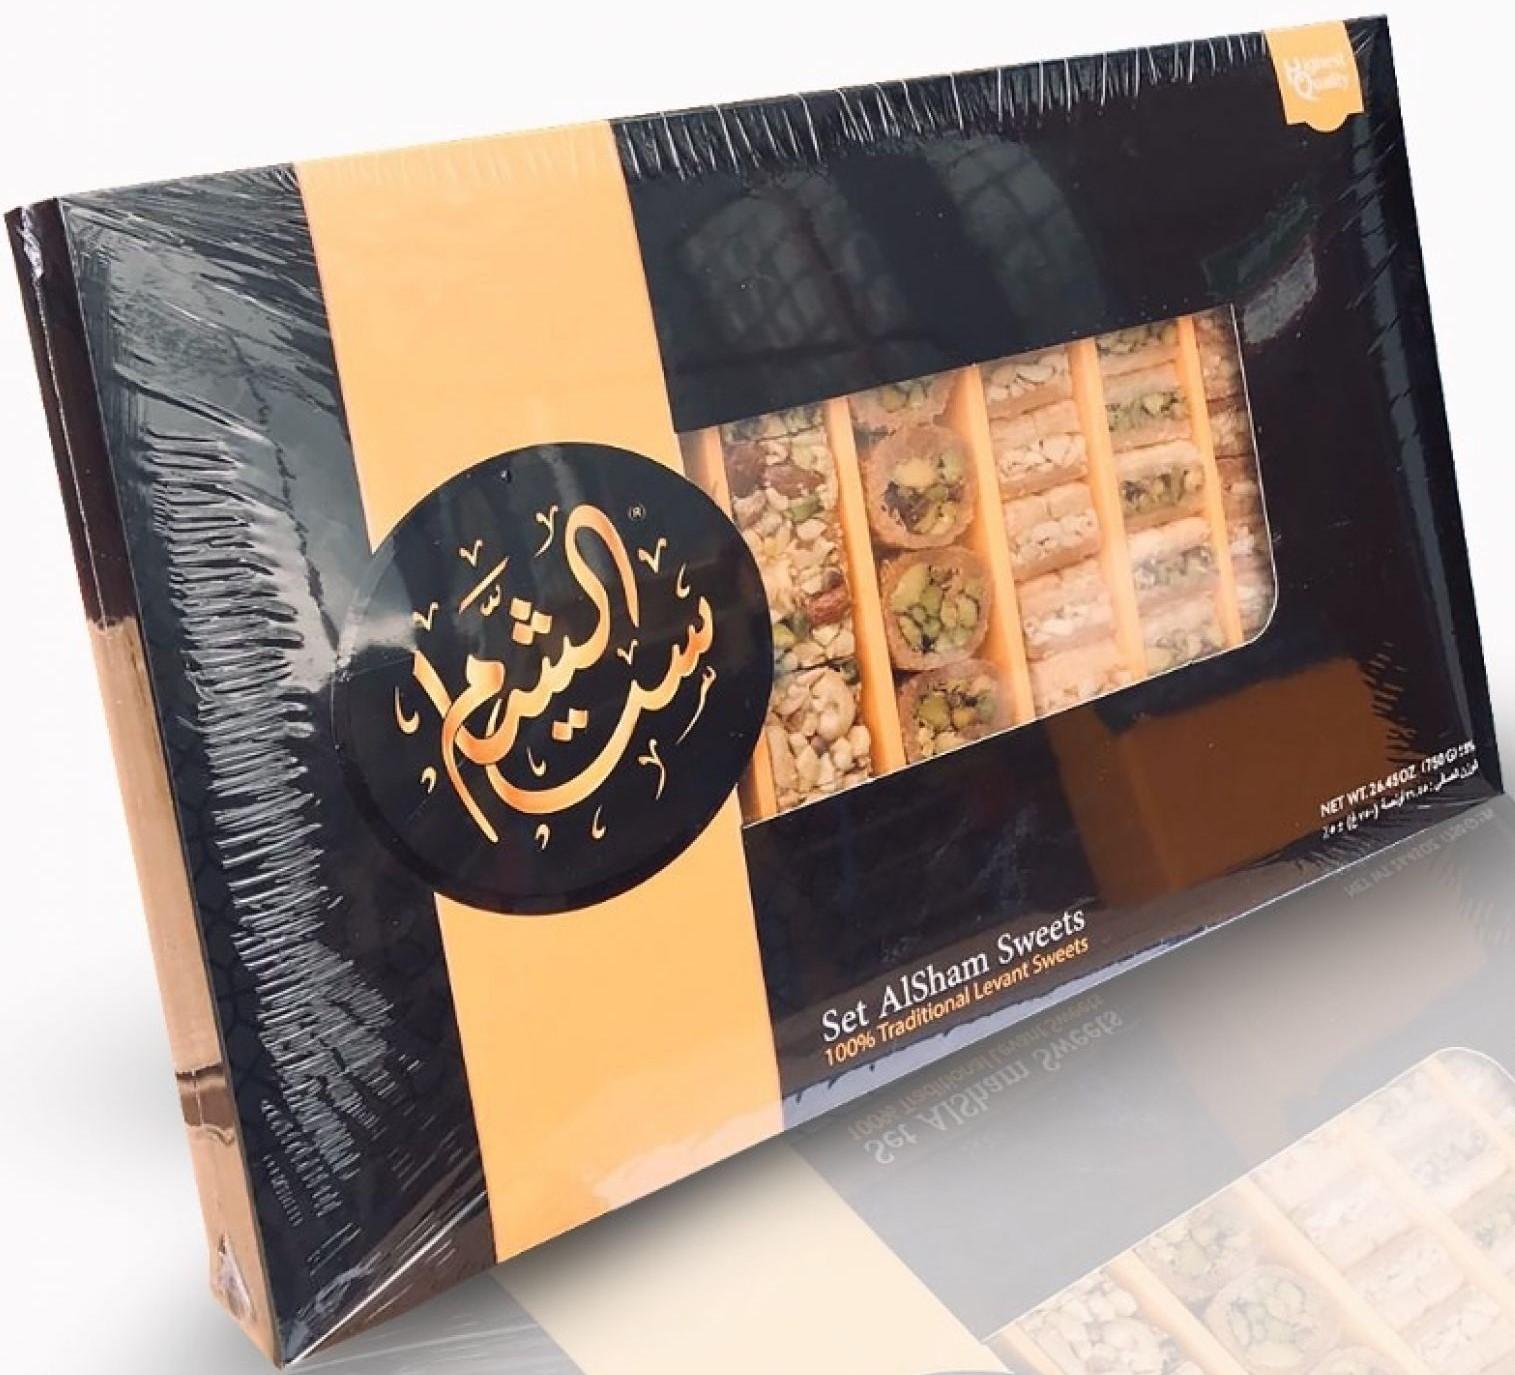 AlSham sweets Baklava 750g  بقلاوة ست الشام حلويات سورية